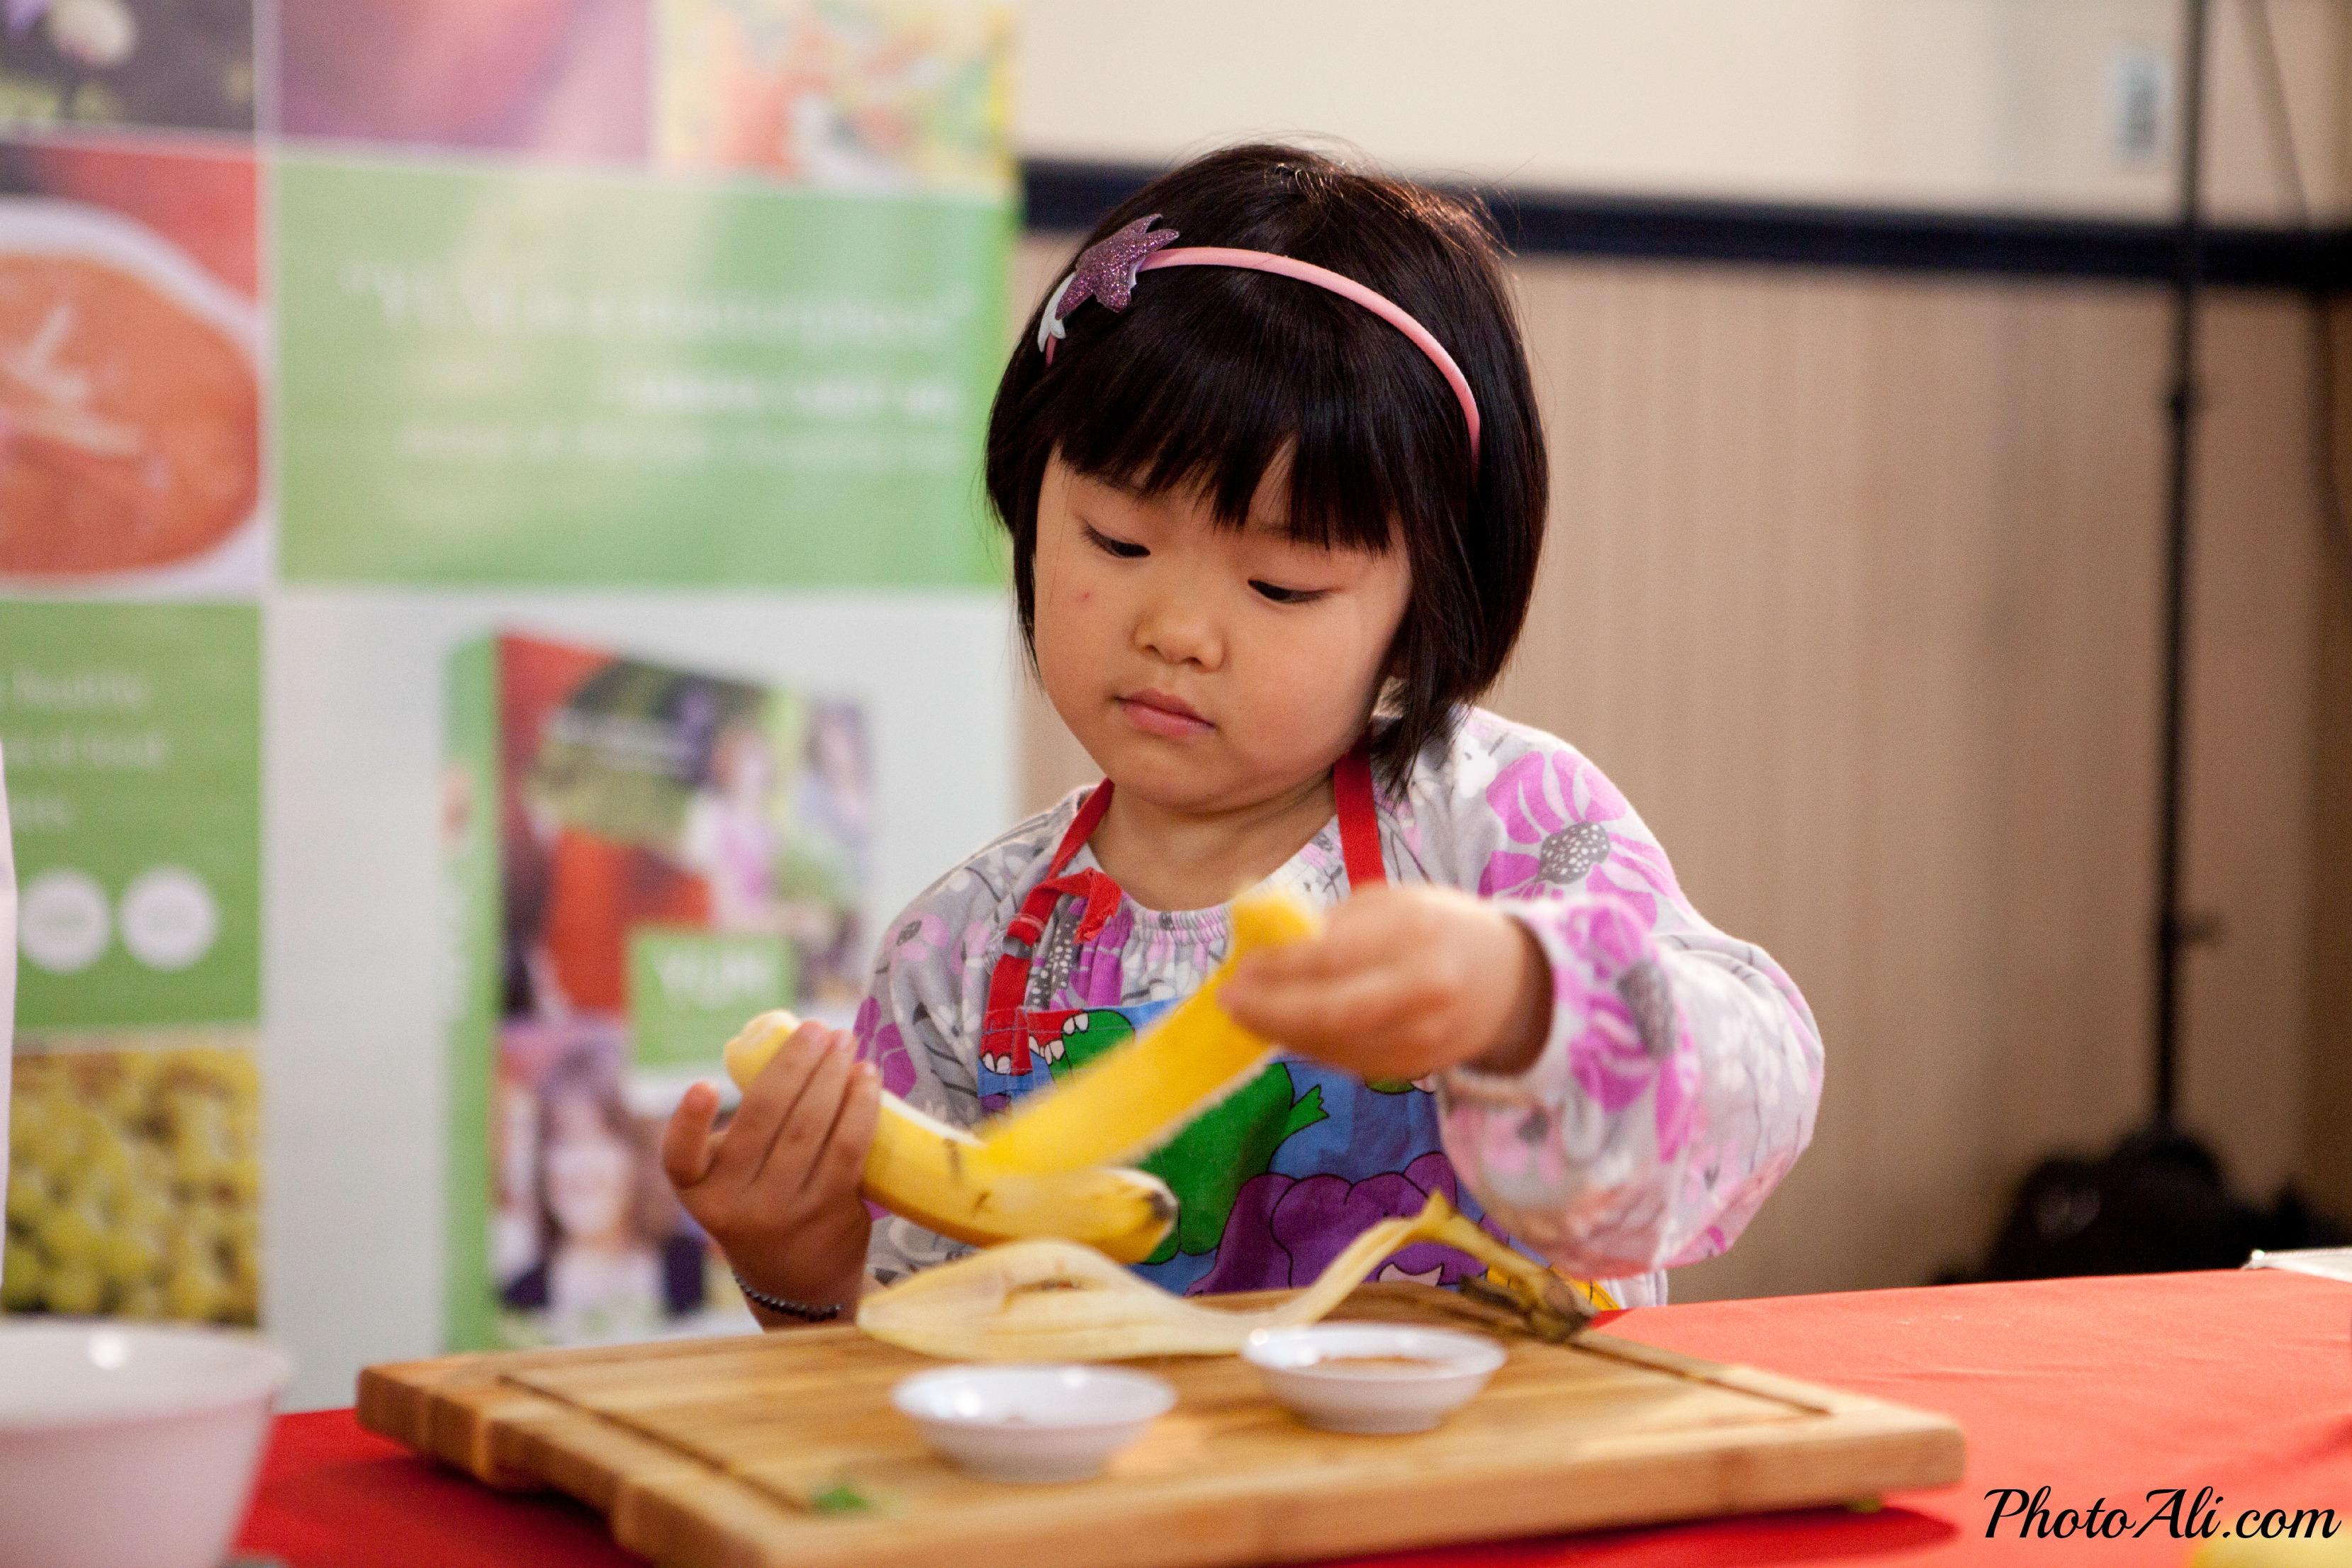 harumi-peeling-banana